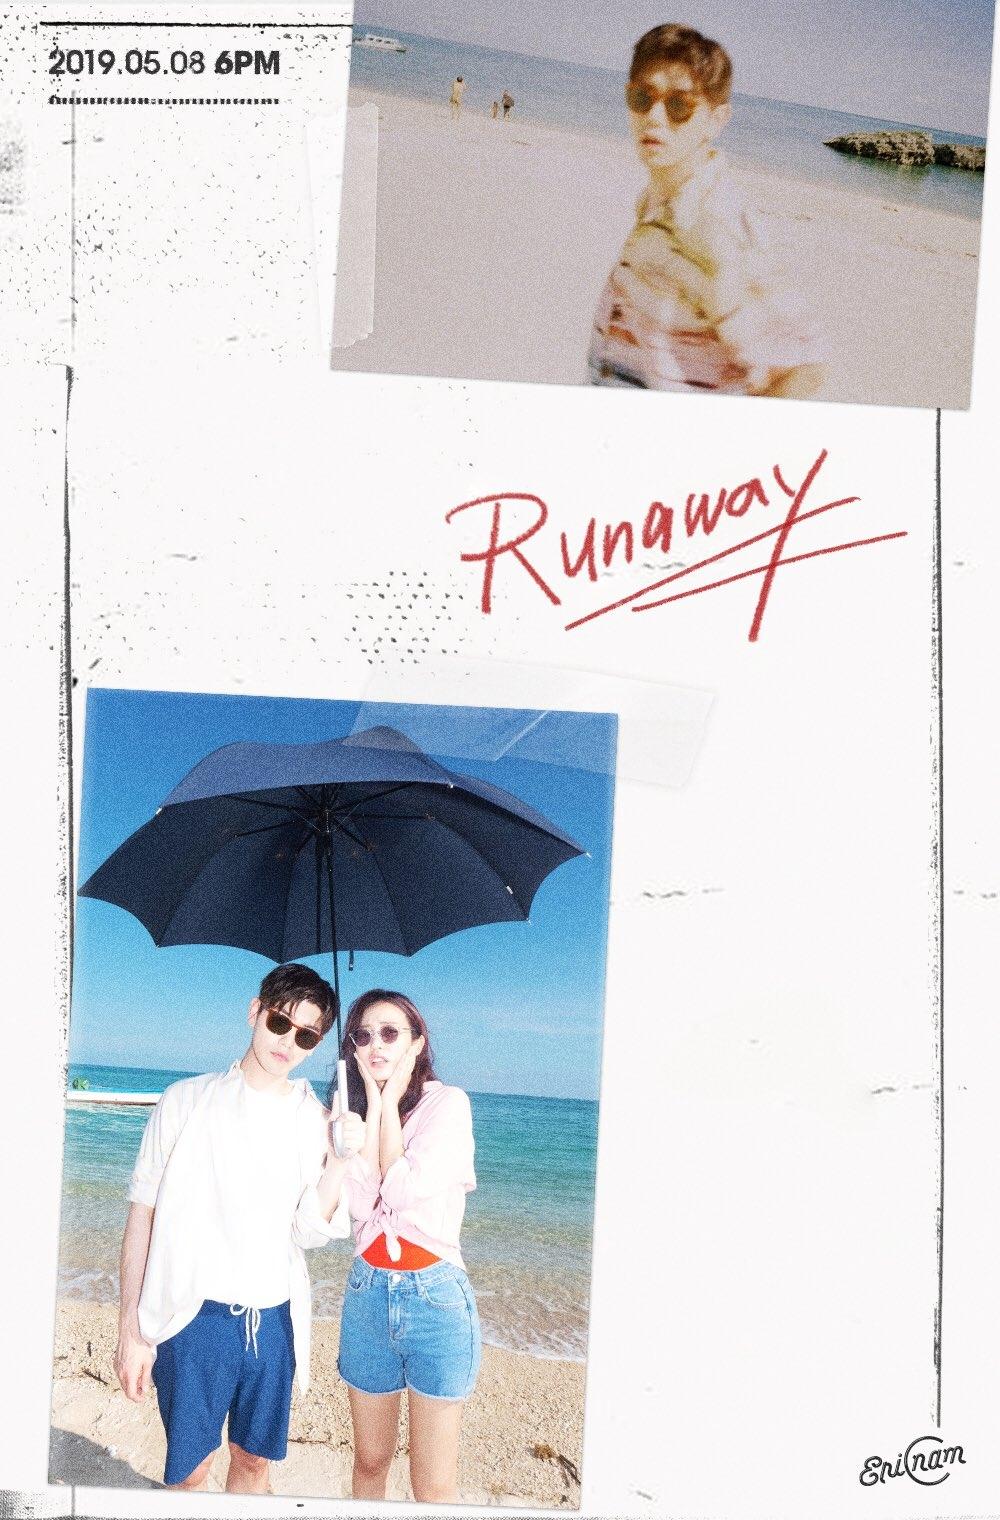 Eric-nam-runaway-002